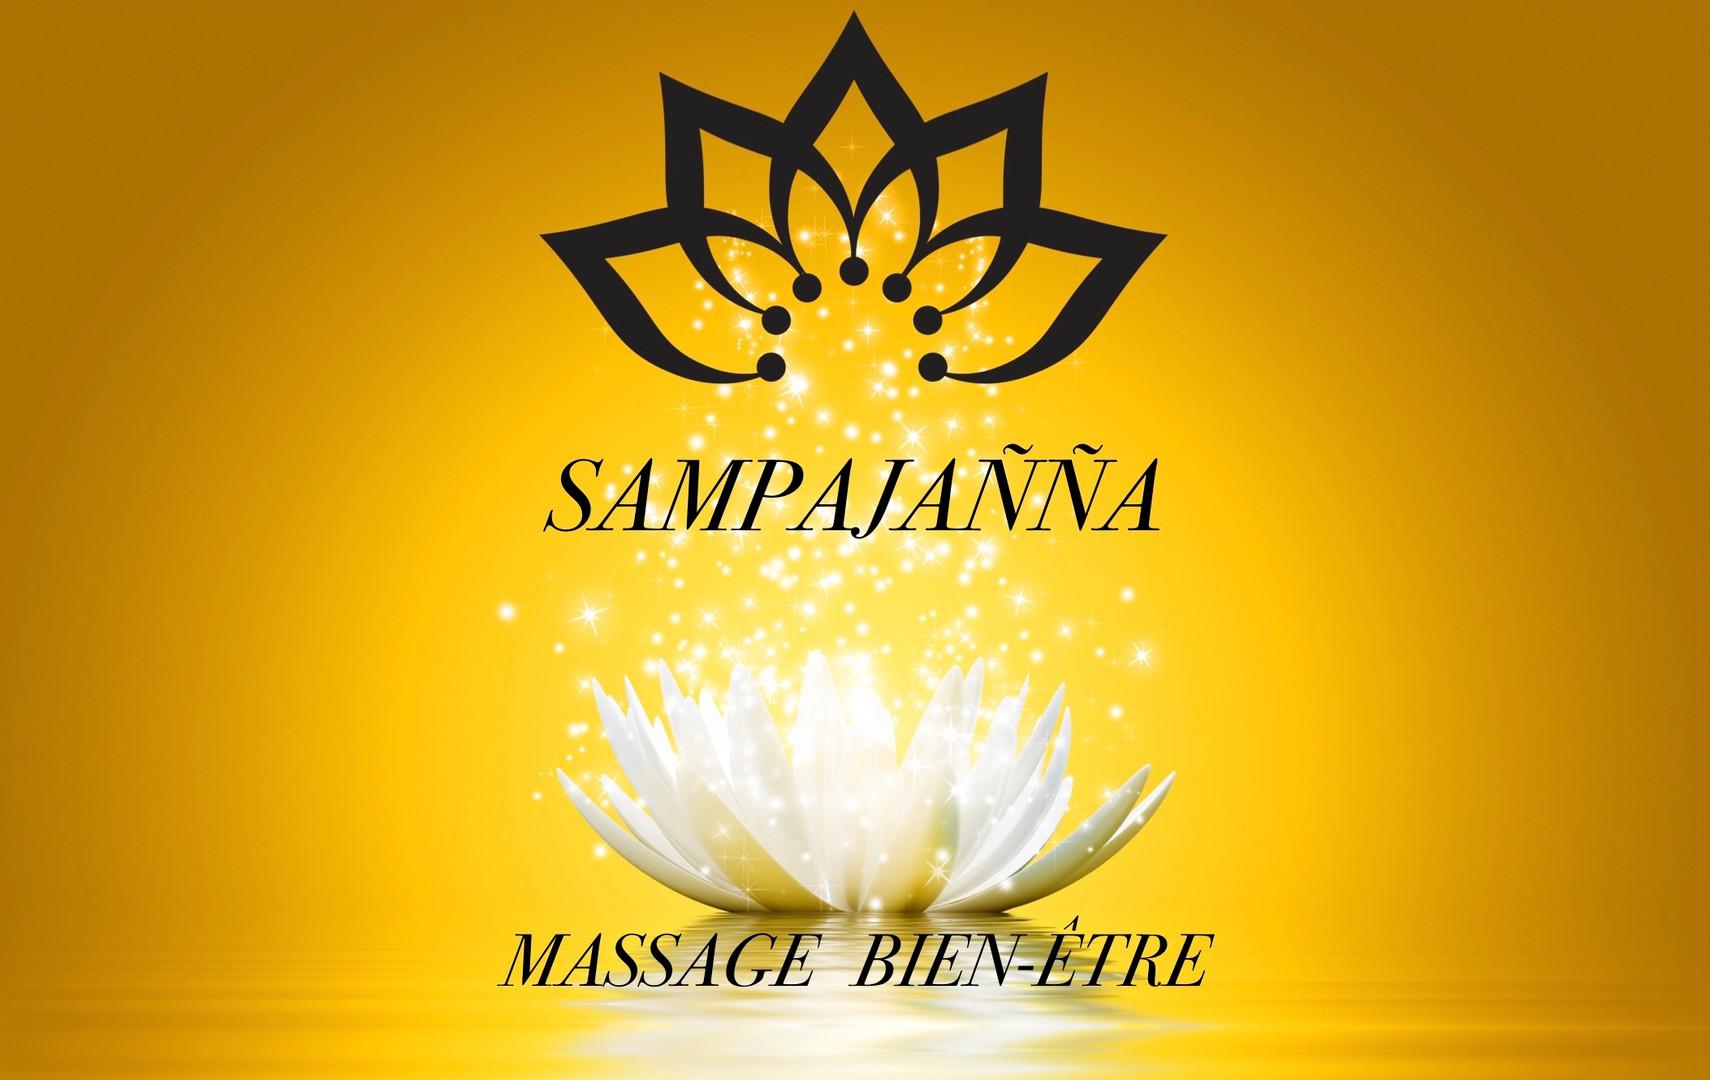 Sampajanna_bien-être.jpg